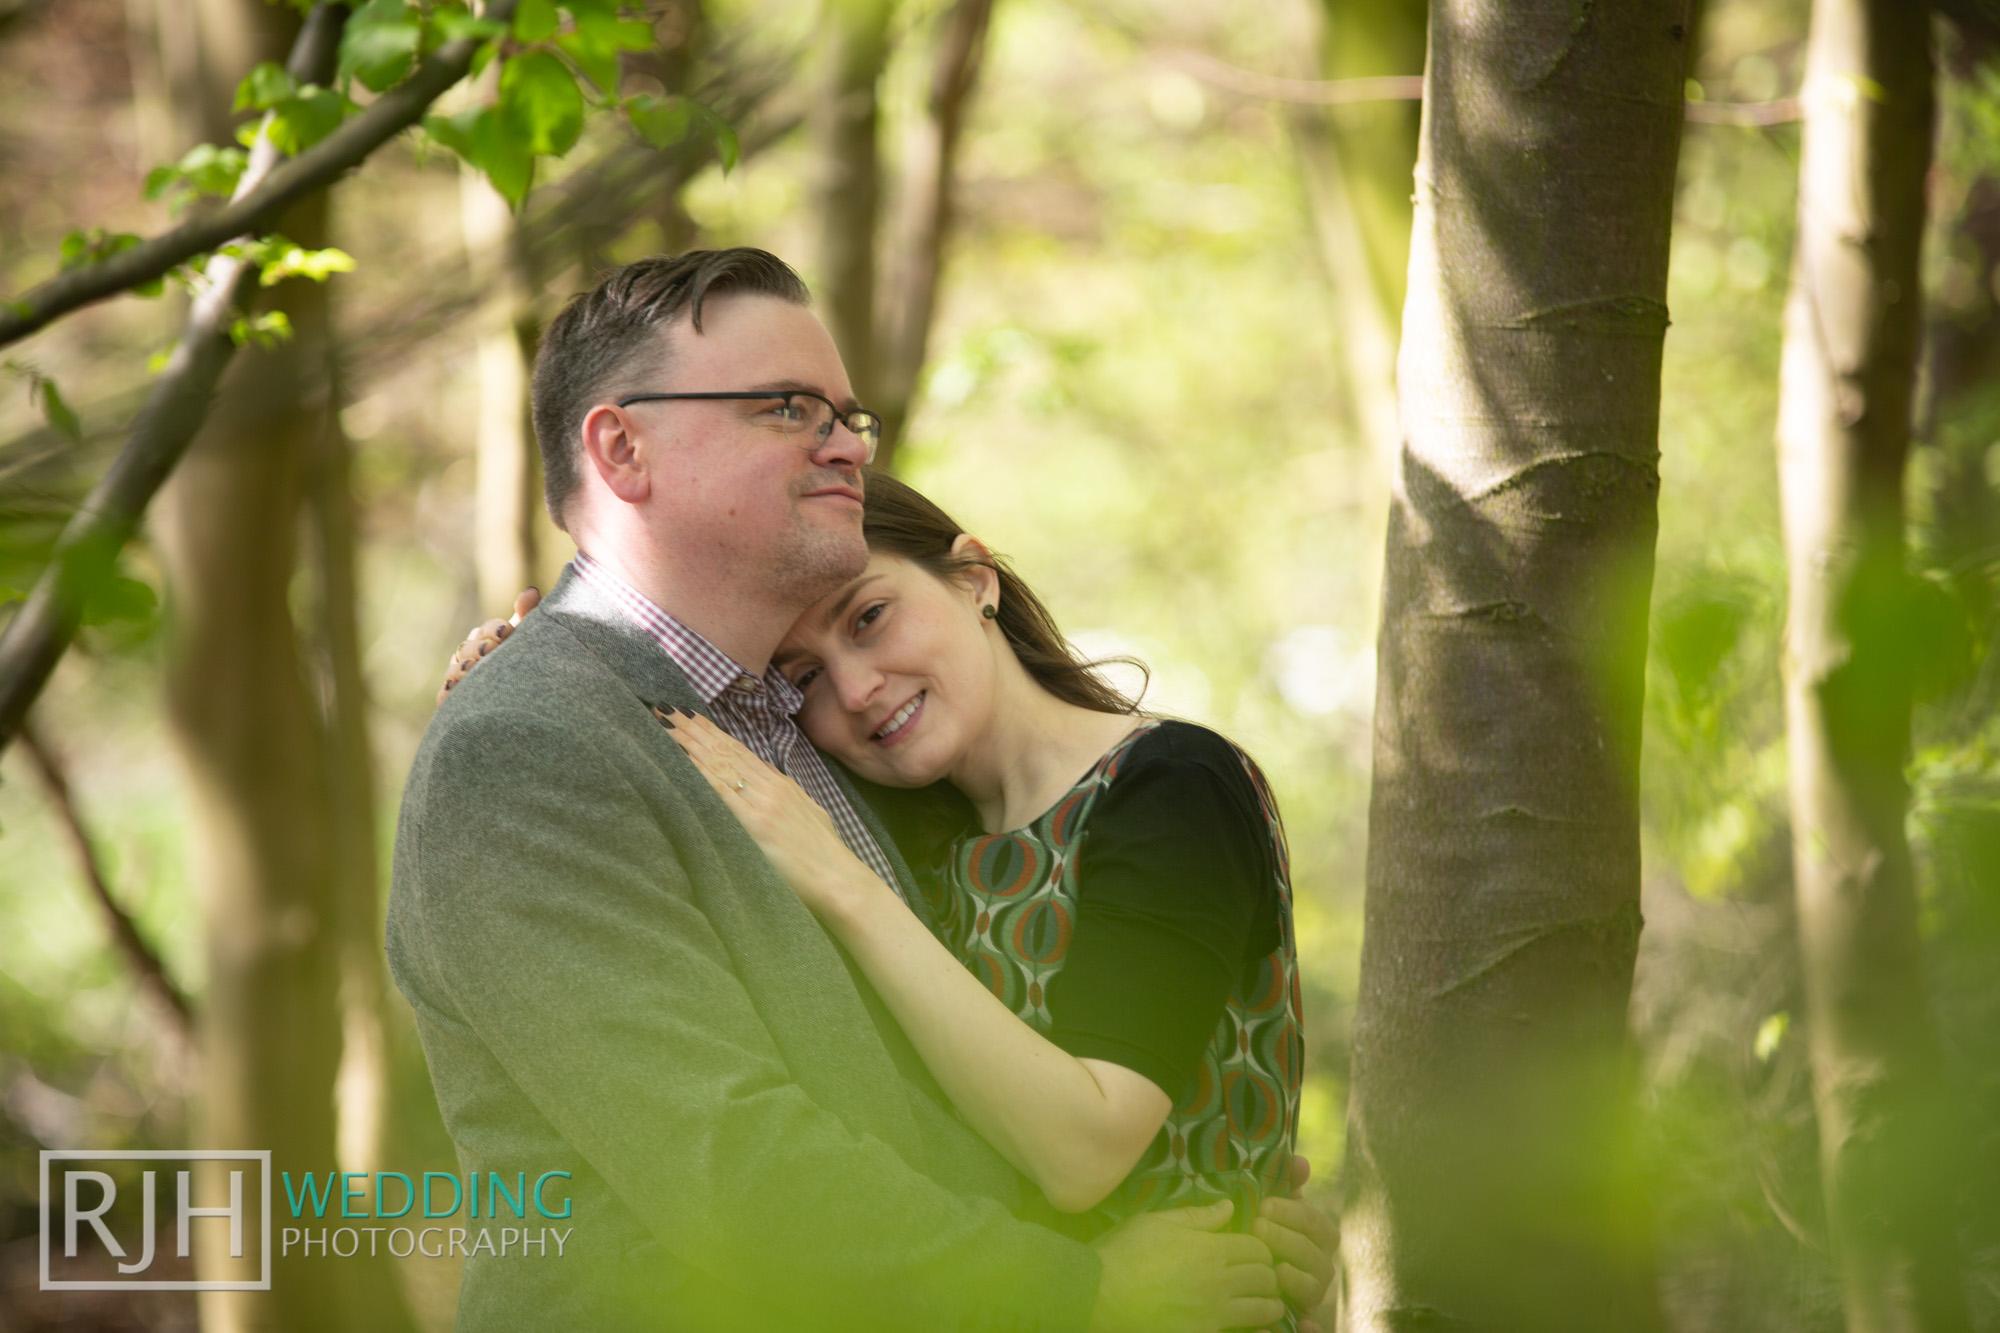 Pre-wedding photography - Richard & Rachel_009_3C2A8159.jpg